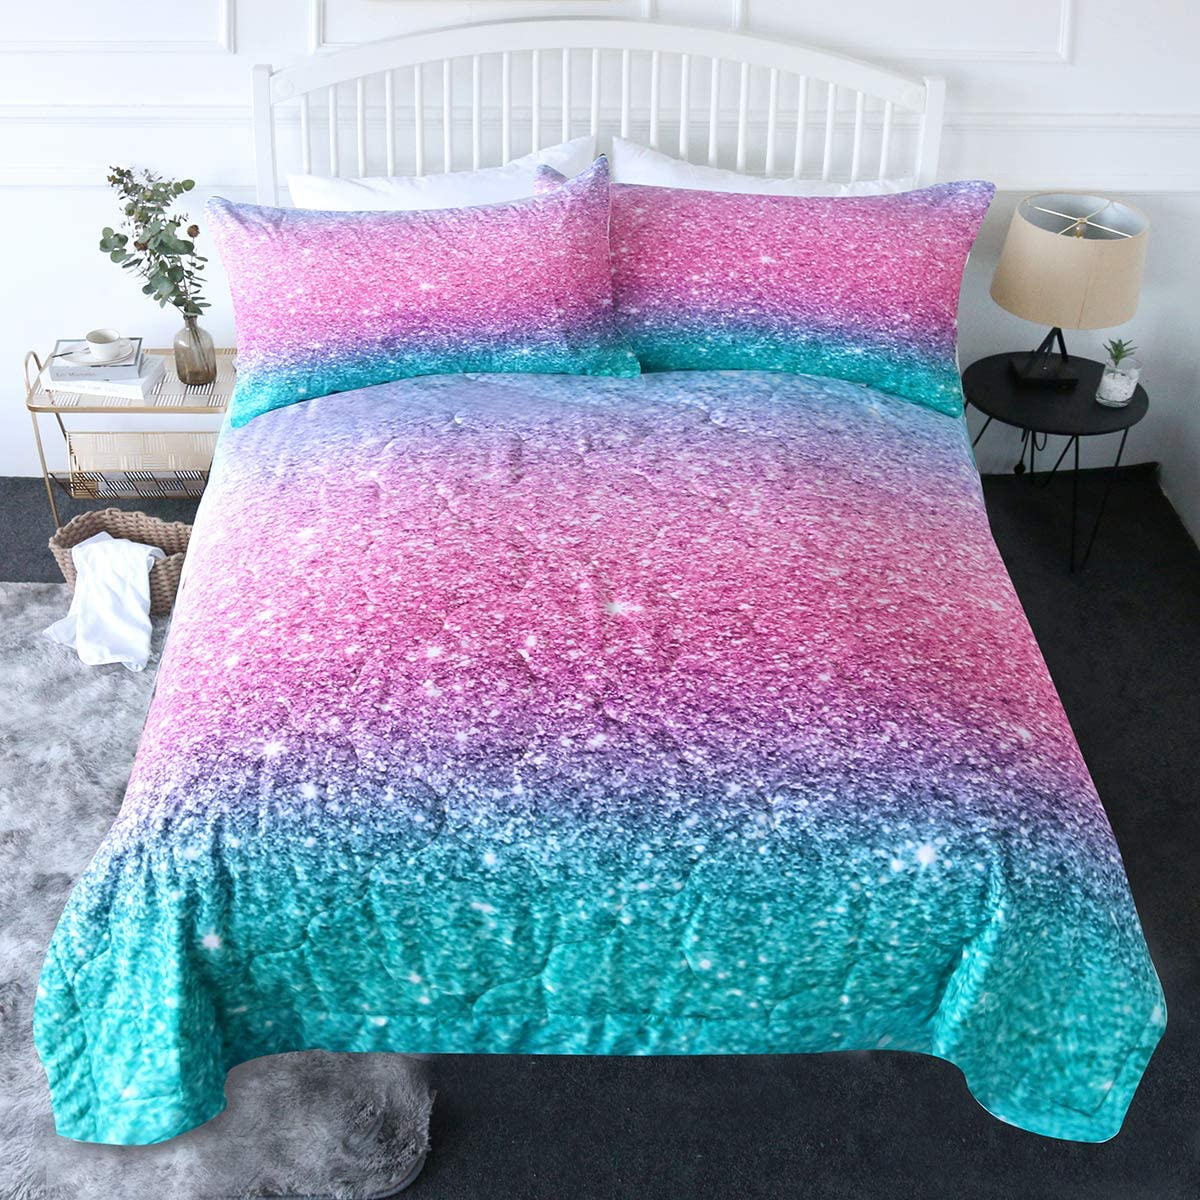 Amazon.com: BlessLiving 3 Piece Comforter Set with Pillow Shams